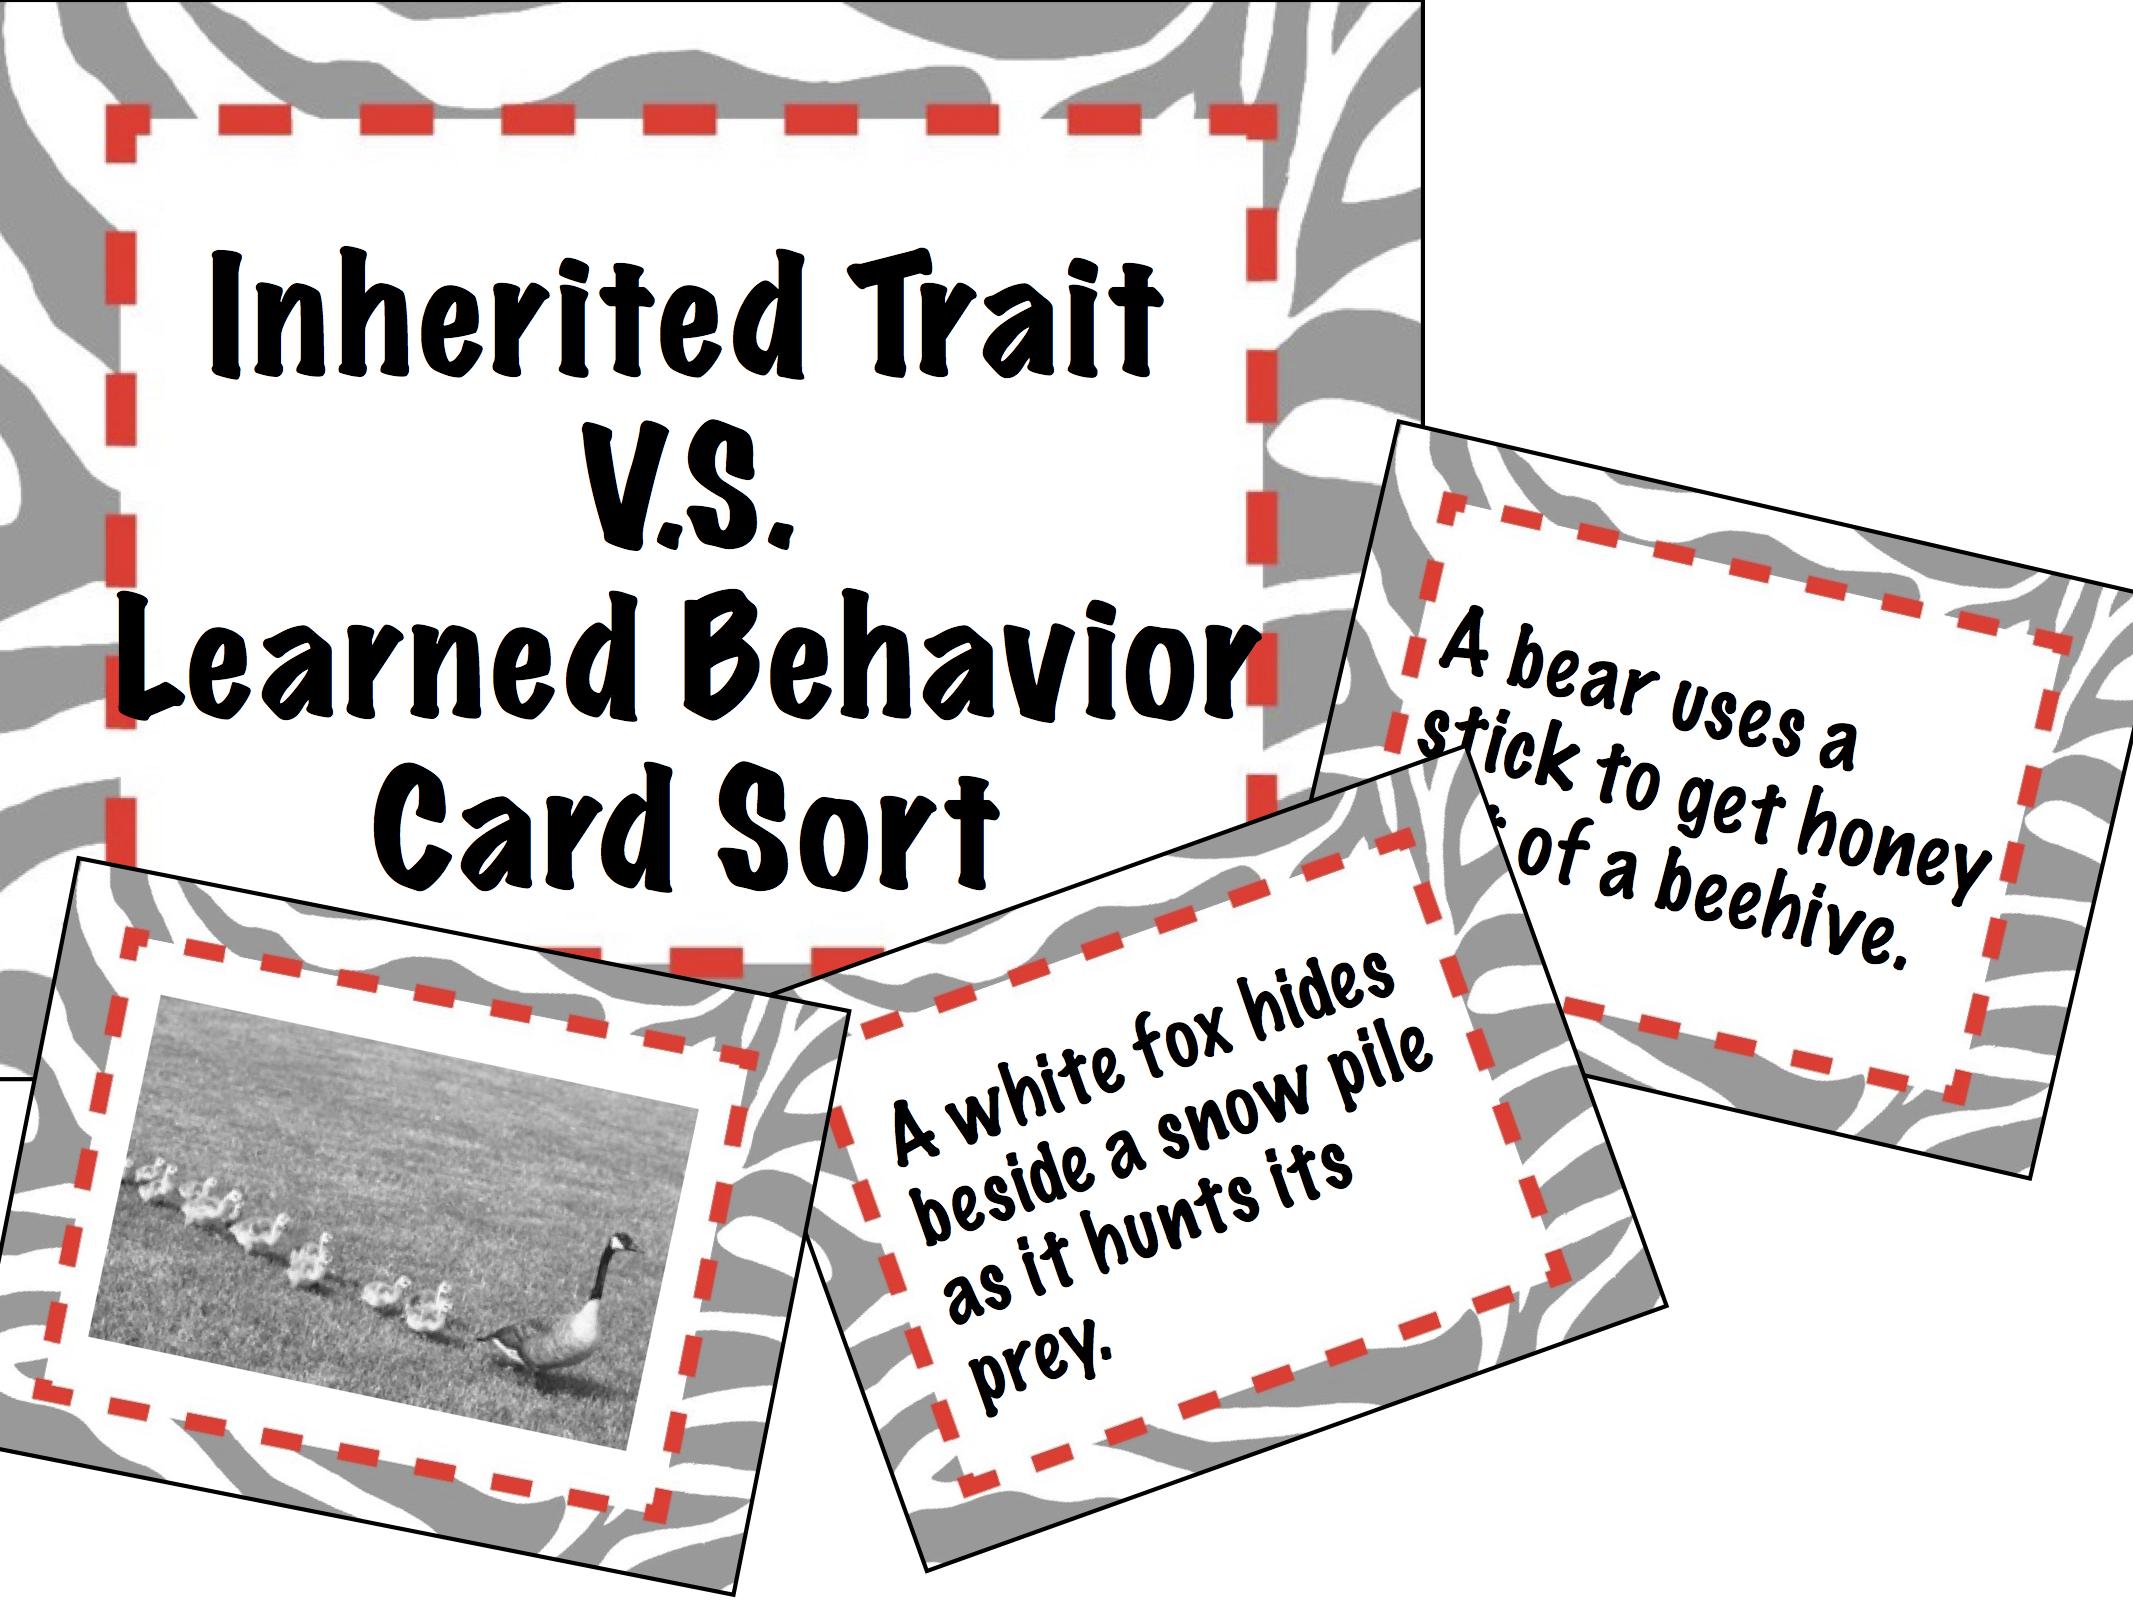 Card Sort Inherited Traits Vs Learned Behavior